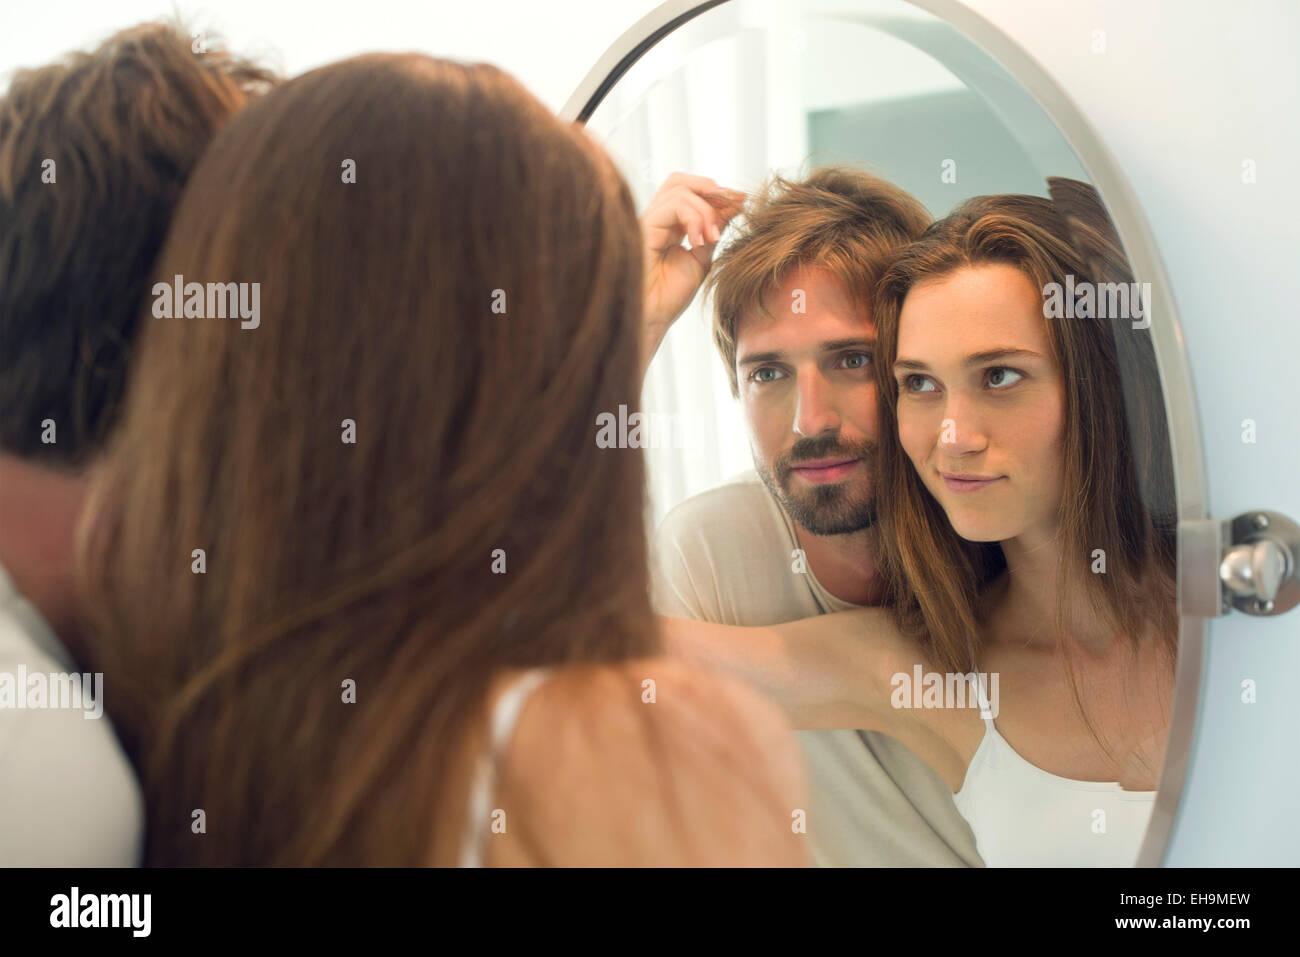 Woman suggesting husband needs haircut - Stock Image